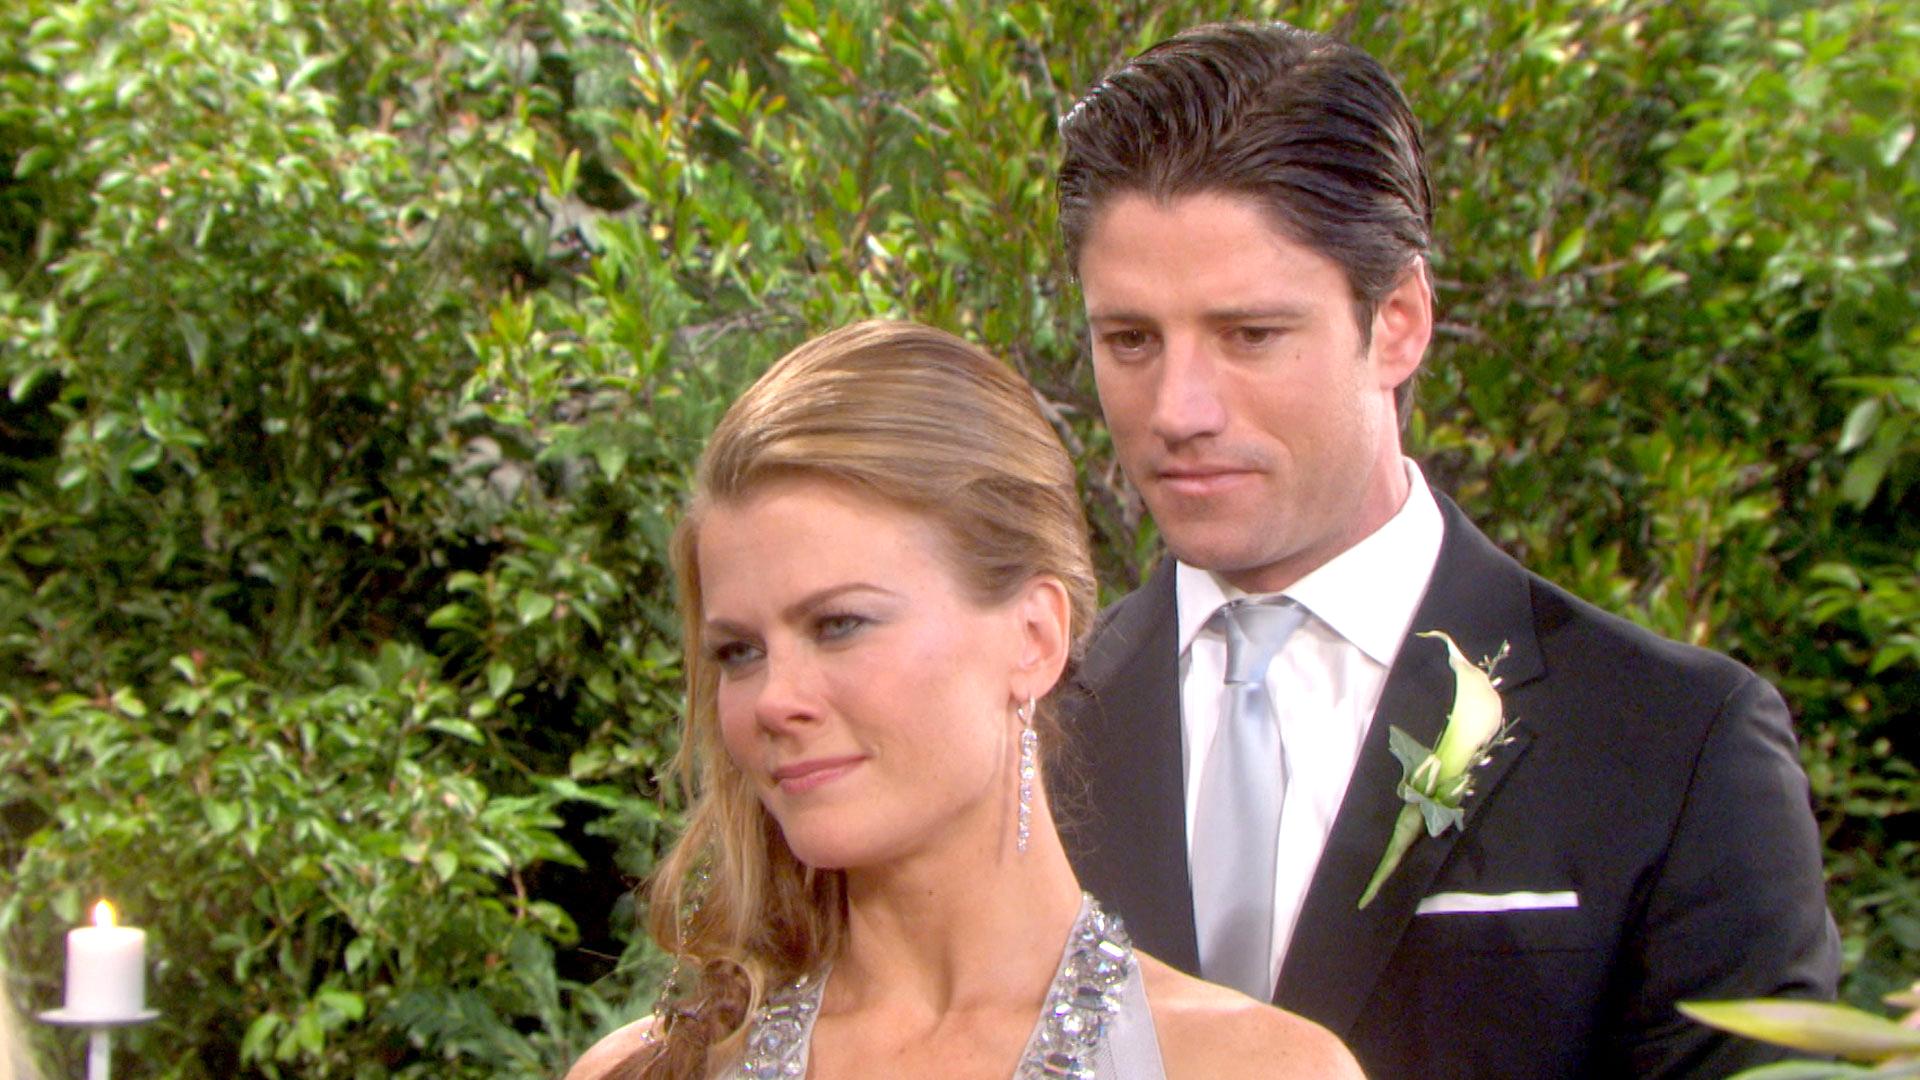 Sami and EJ's wedding begins.